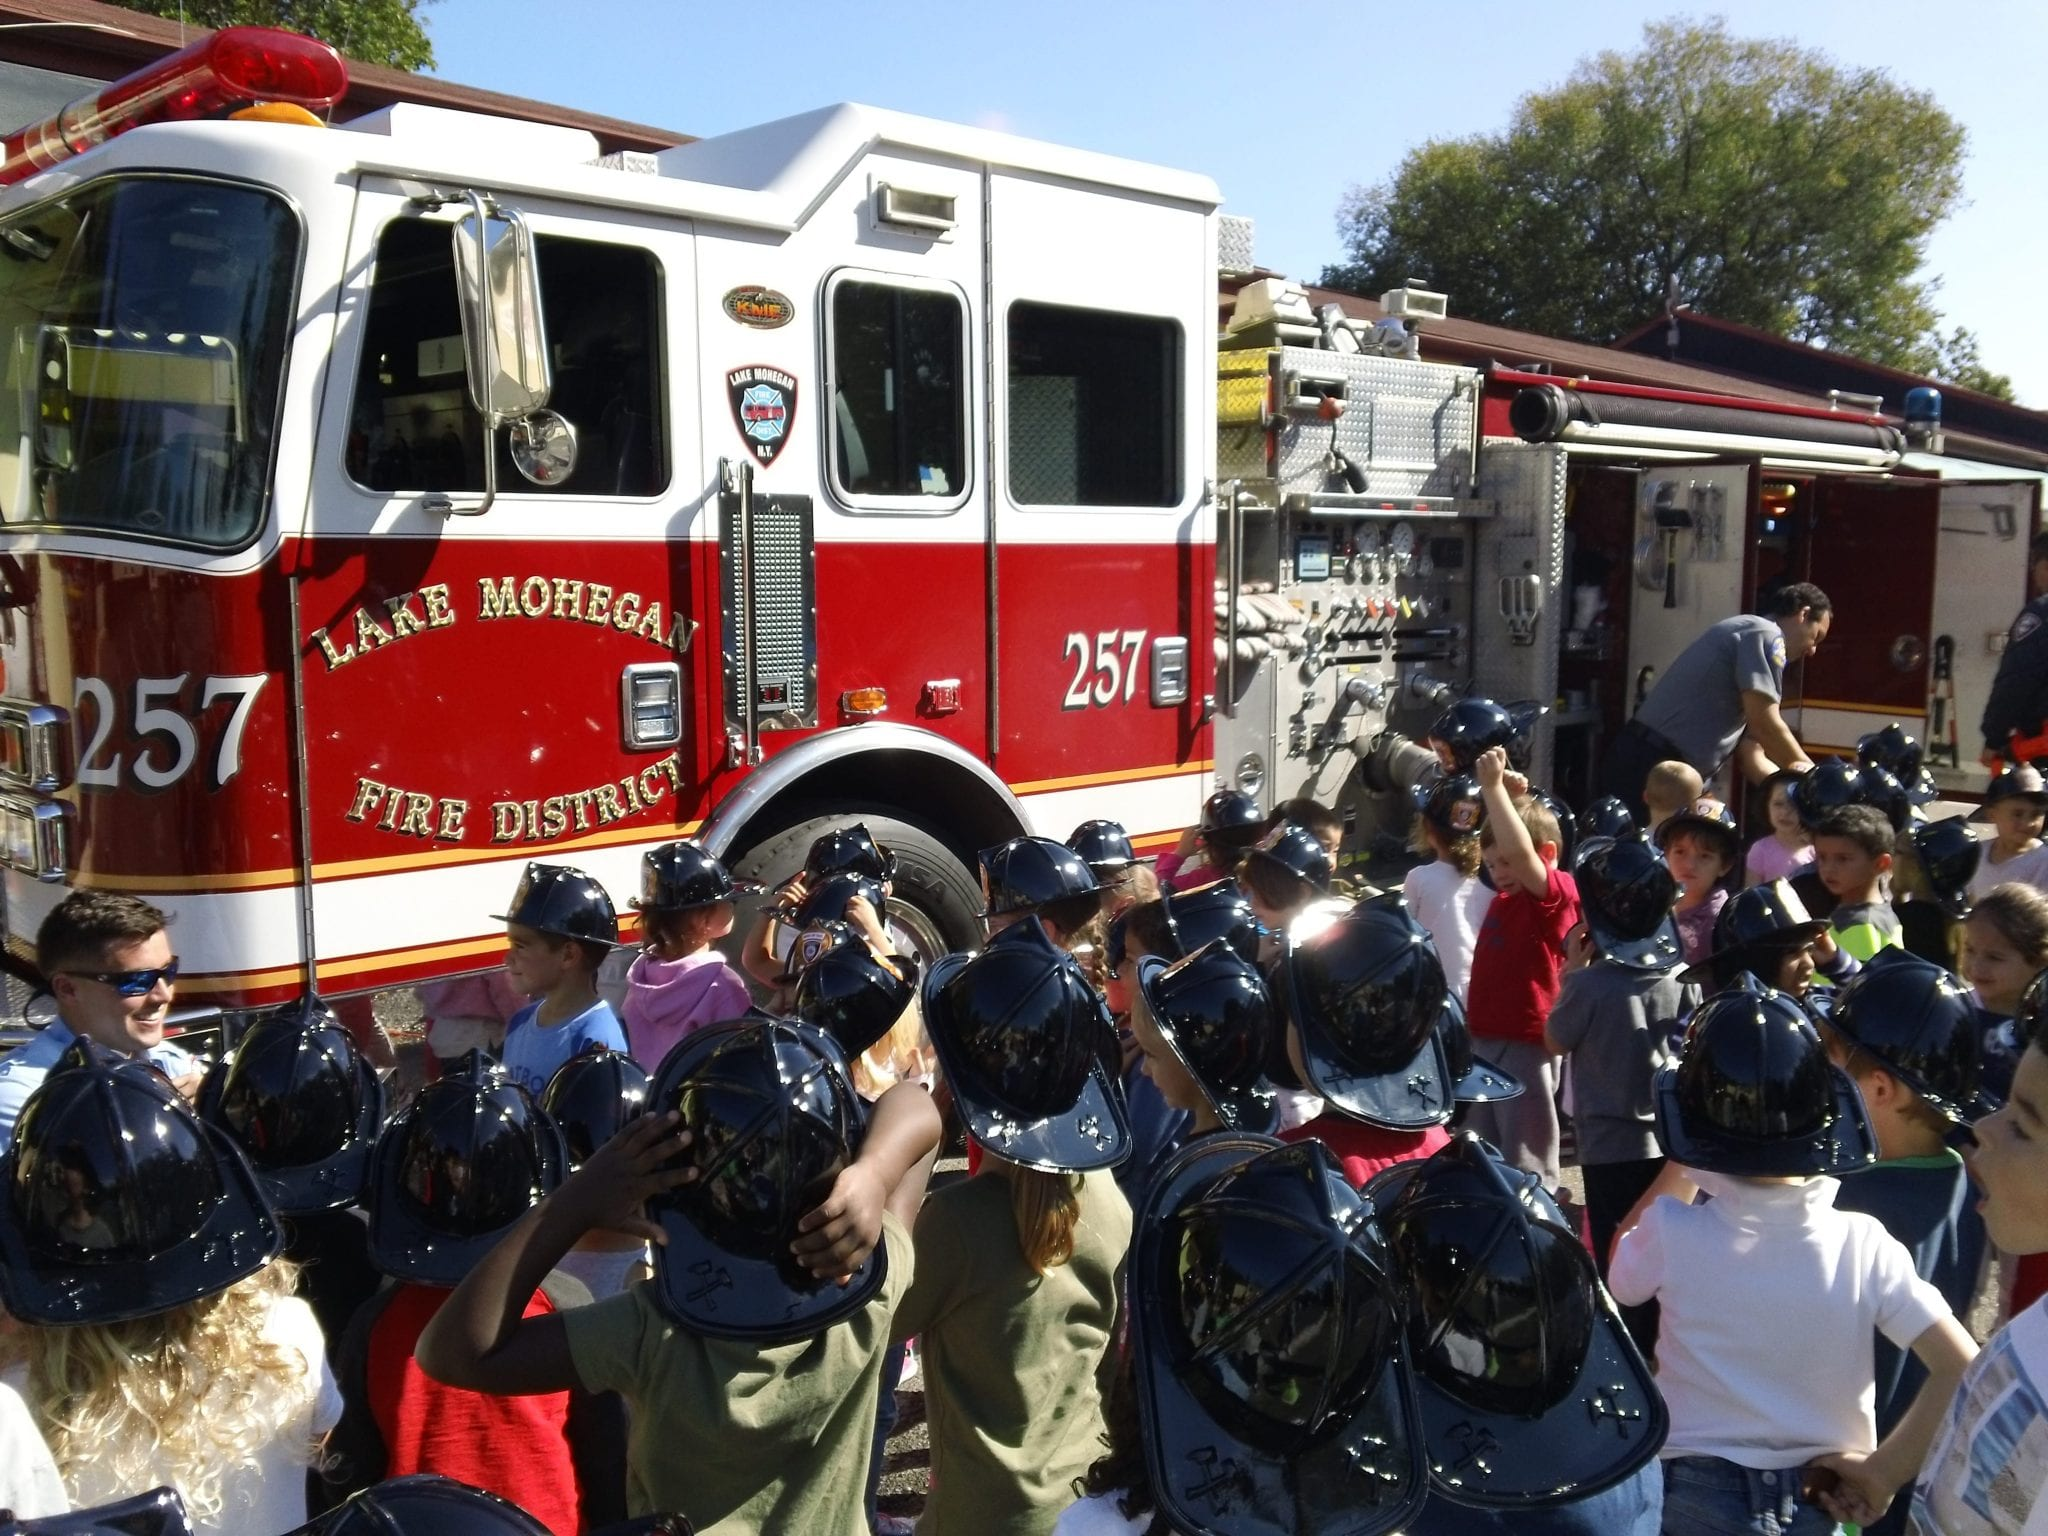 Lake Mohegan Fire Department